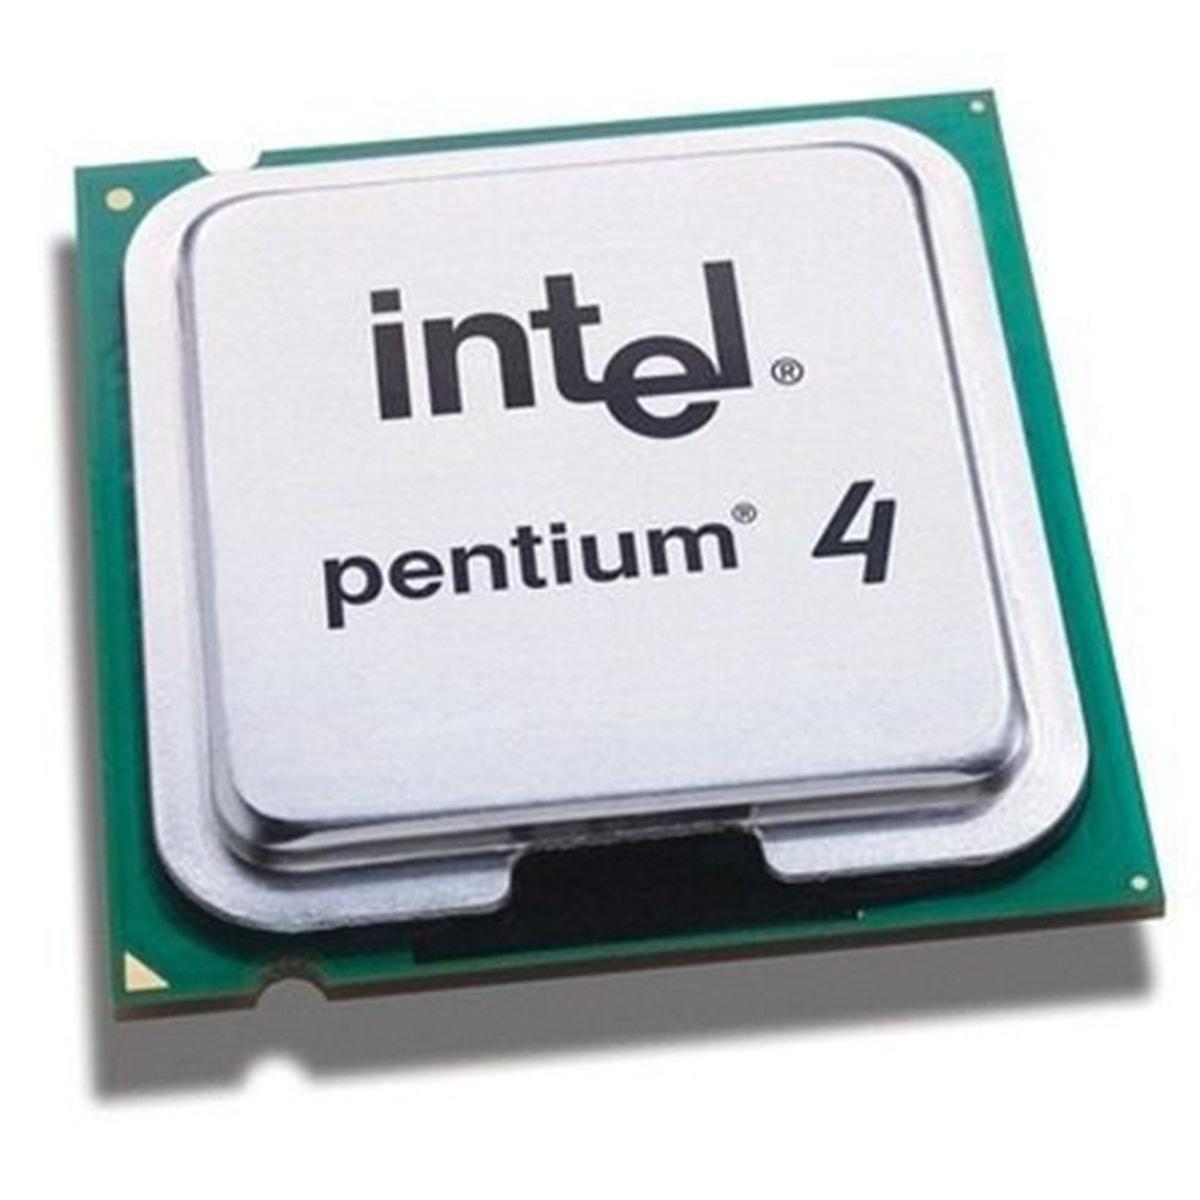 Processador Intel Pentium 4 519K 1M Cache / 3.06 GHz / 533 MHz / Socket 775 - Seminovo